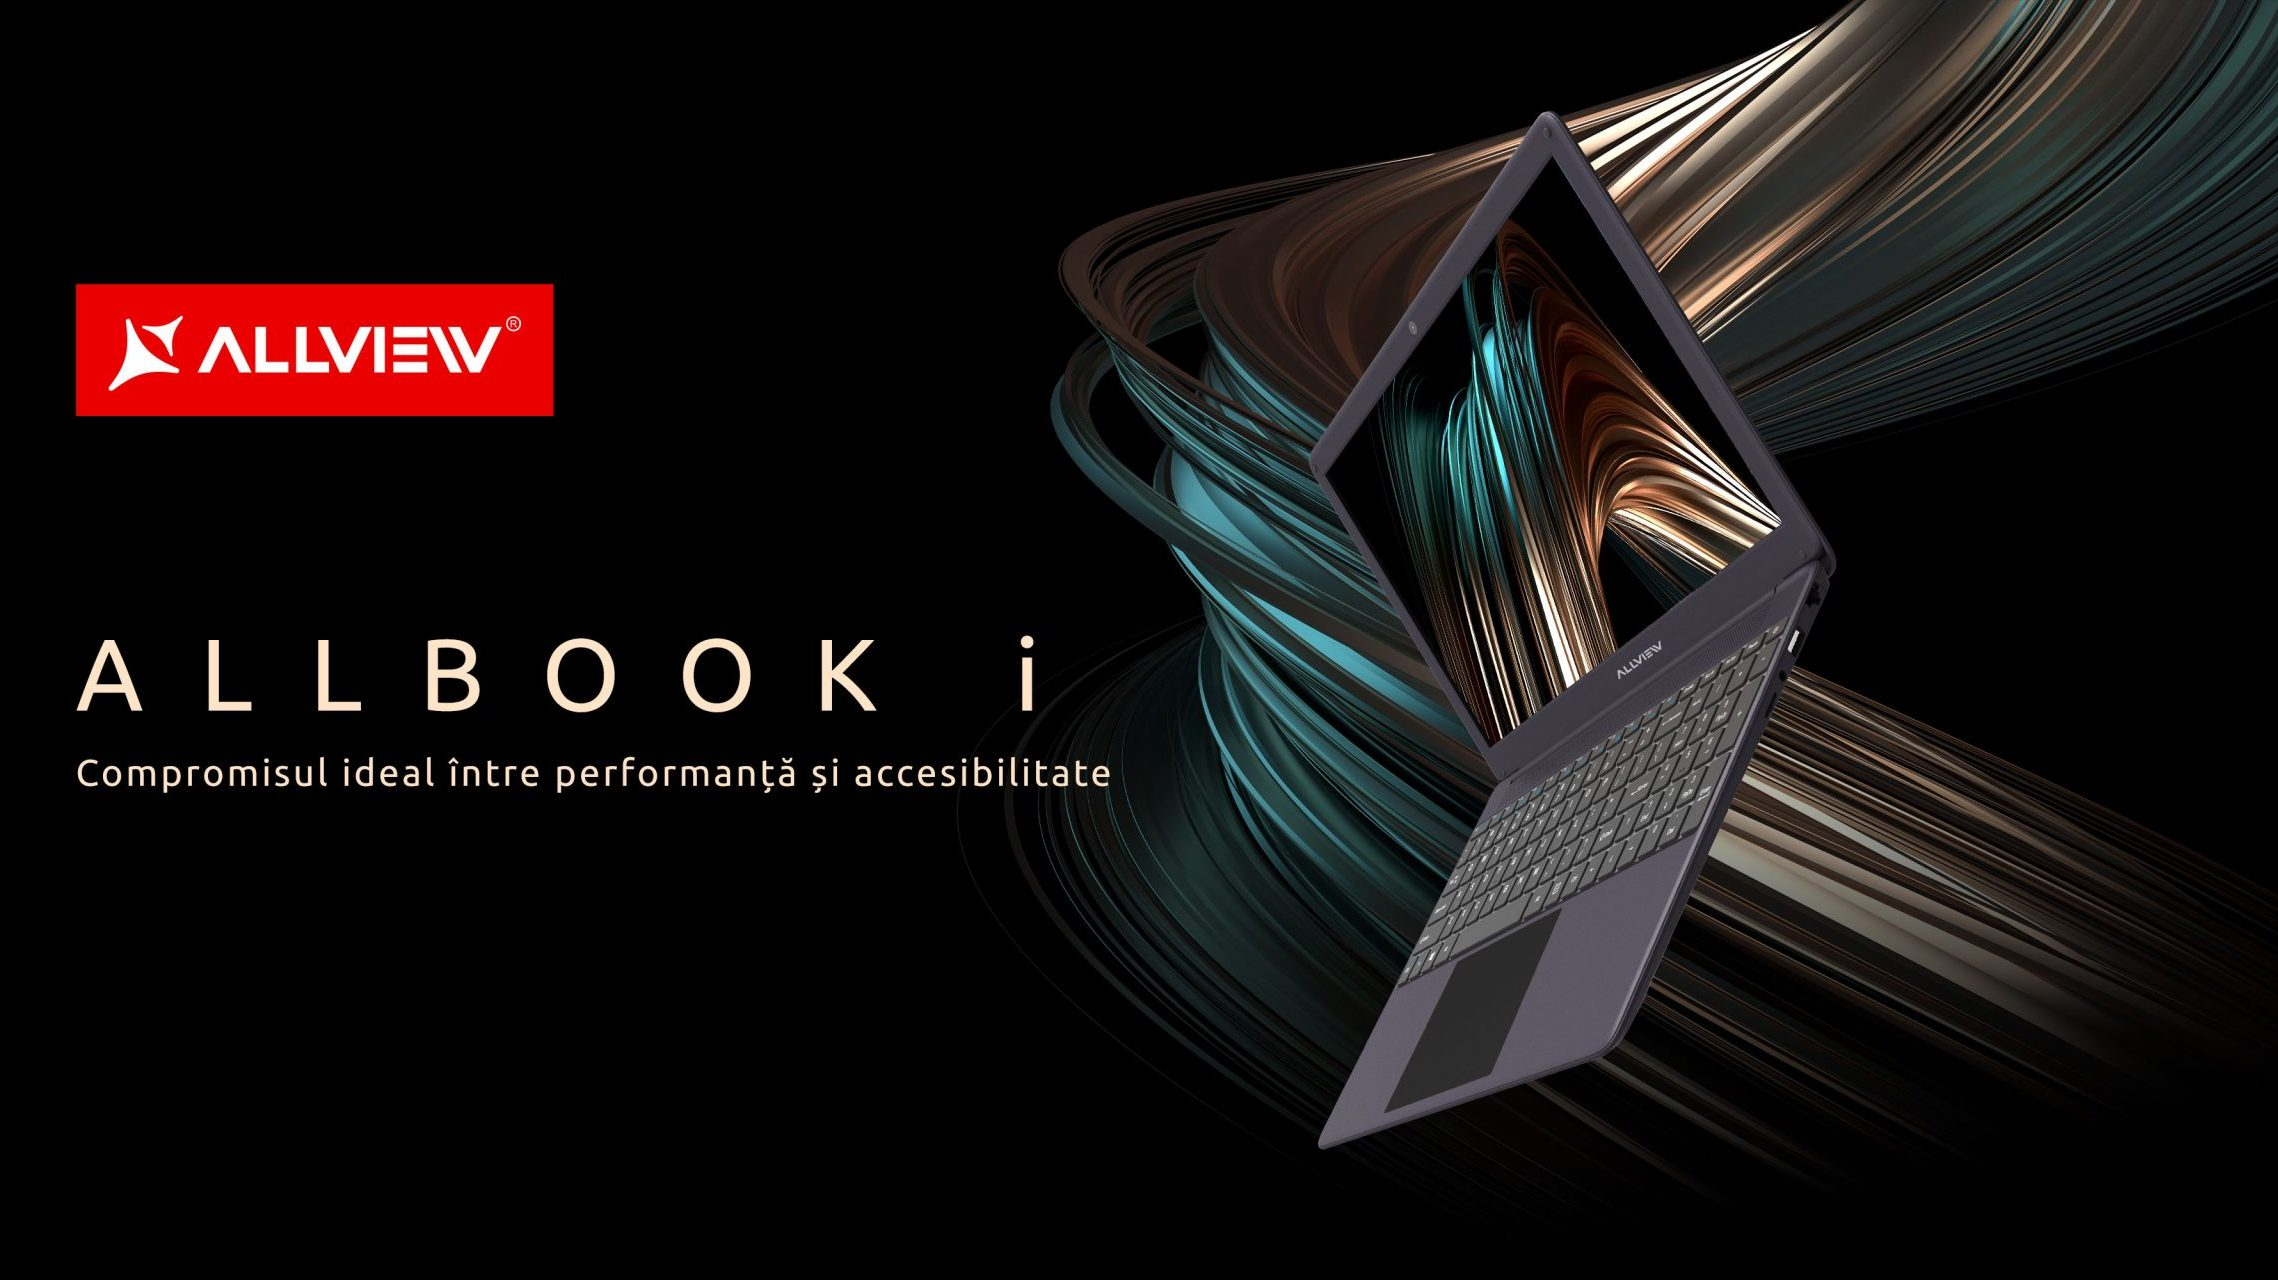 Allview lansează laptopul Allbook i